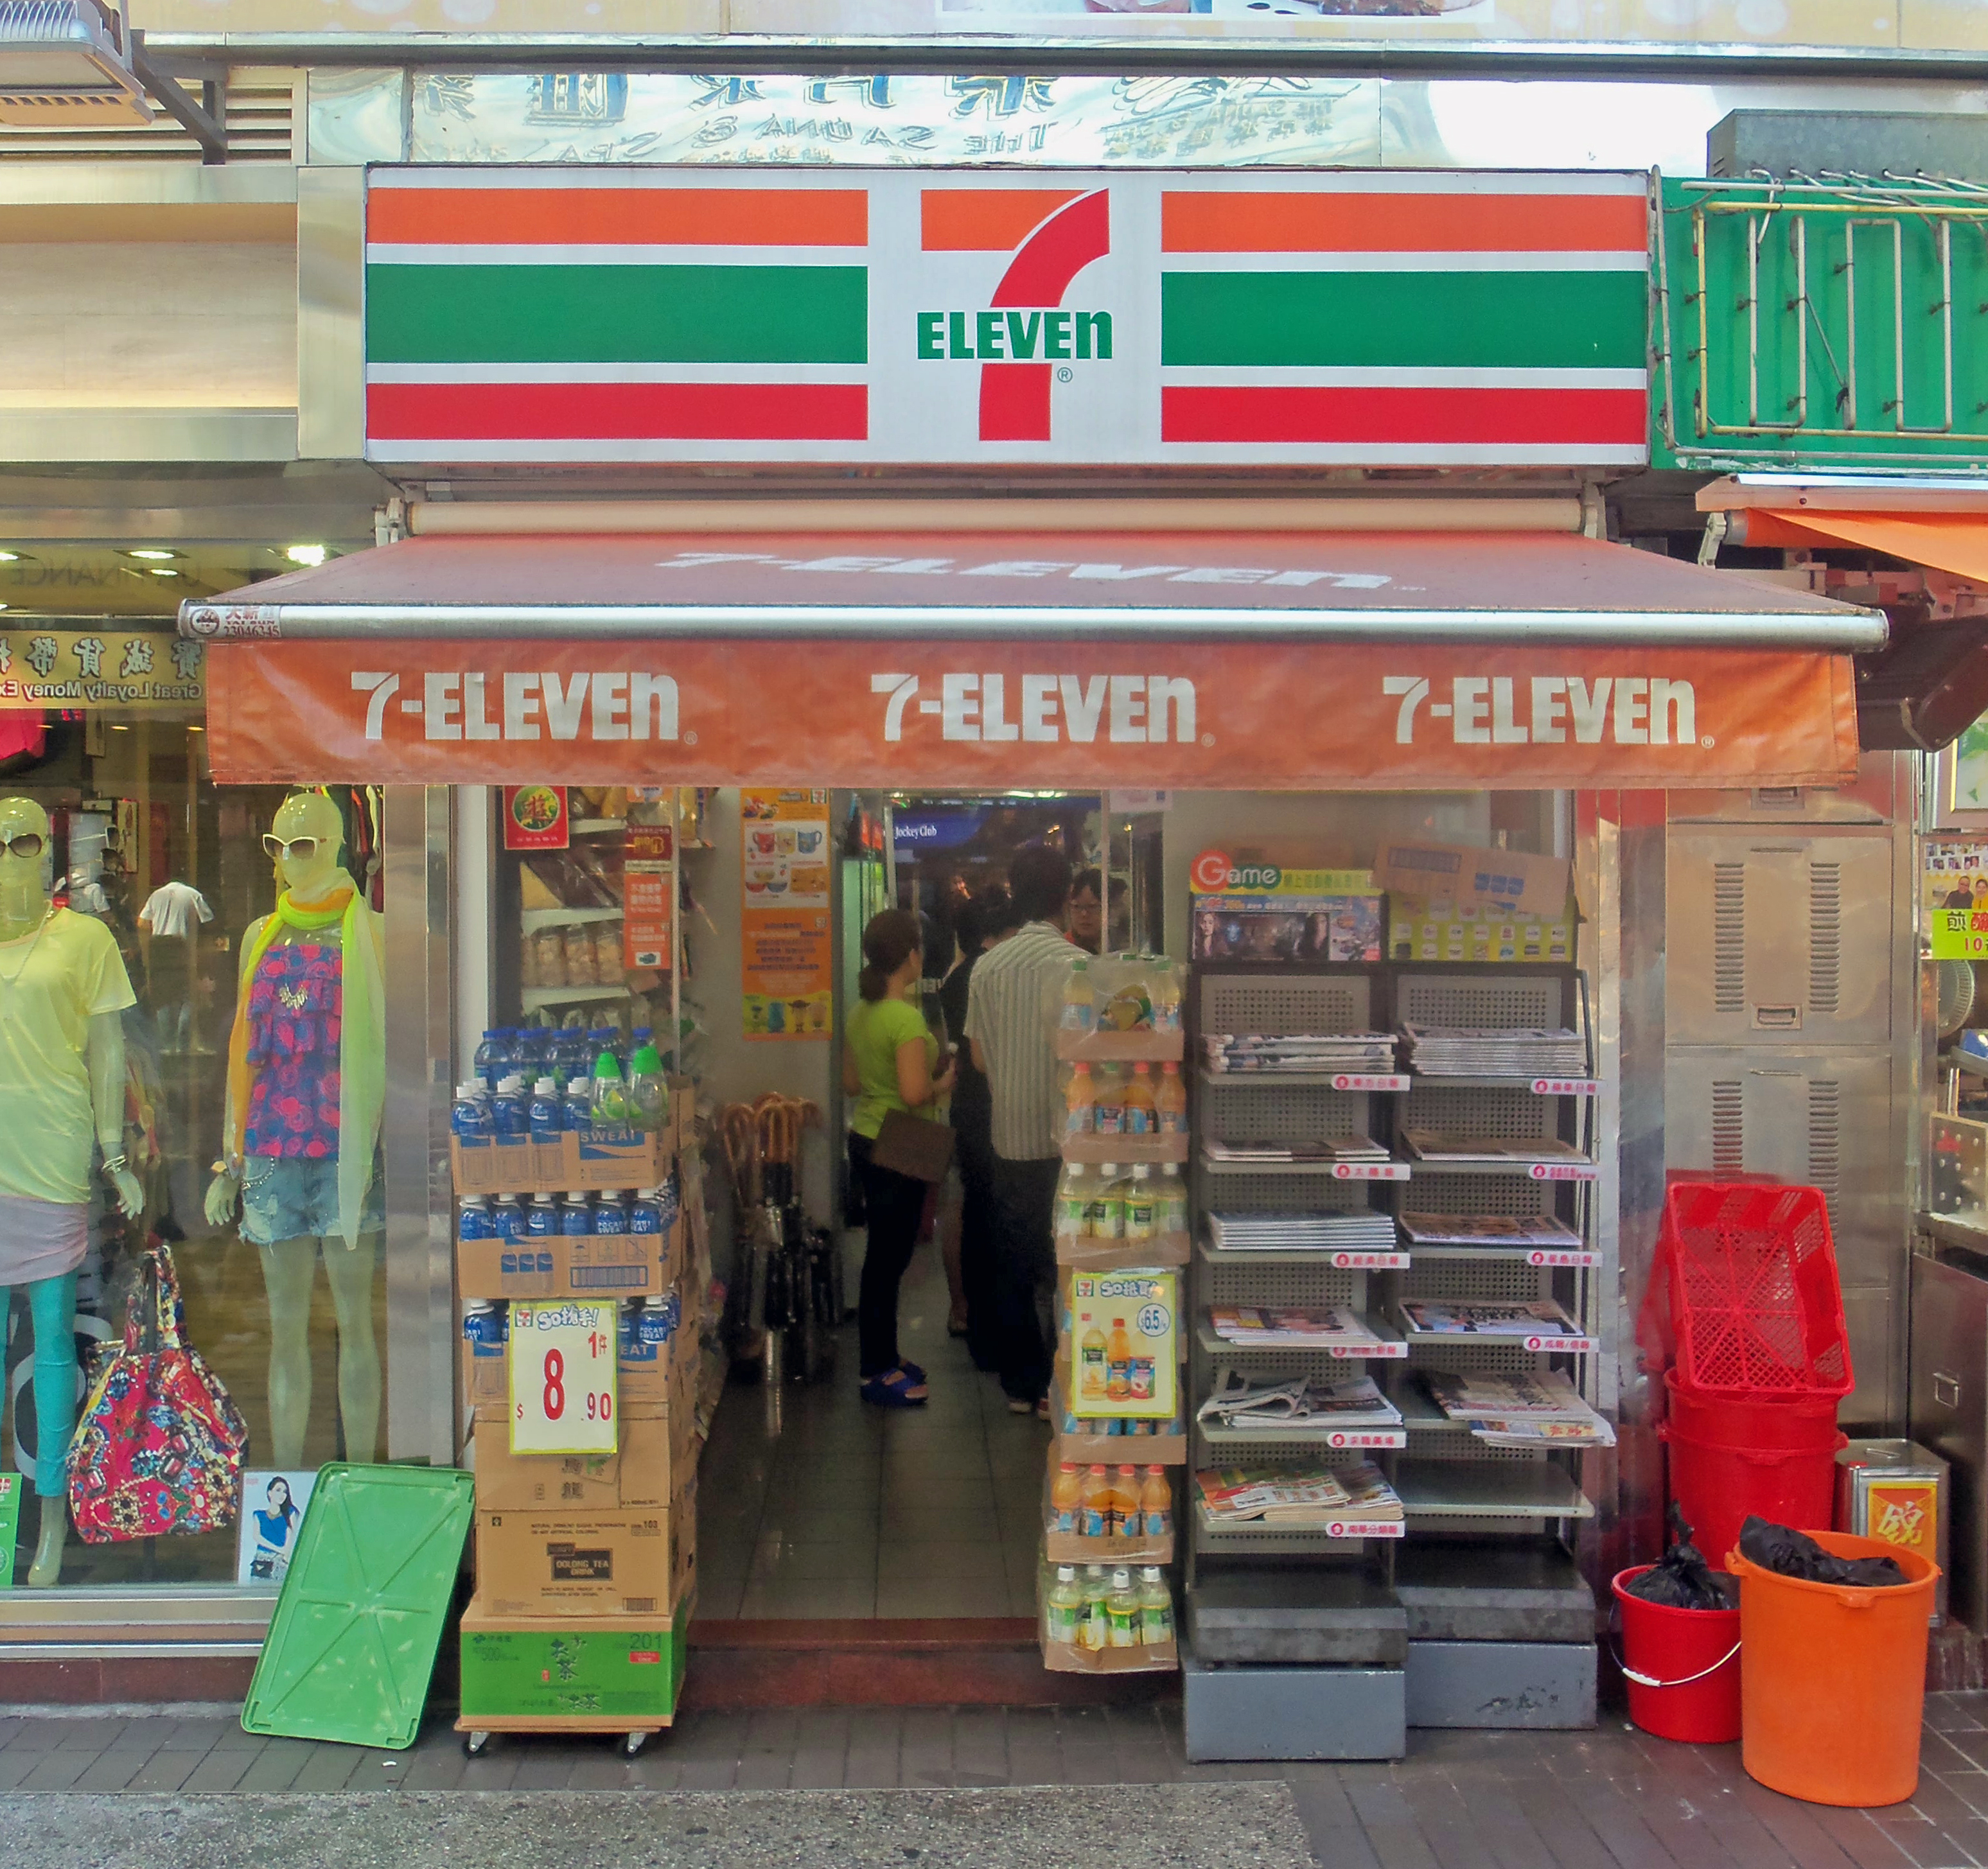 filestorefront 711 in tsim sha tsui hong kongjpg